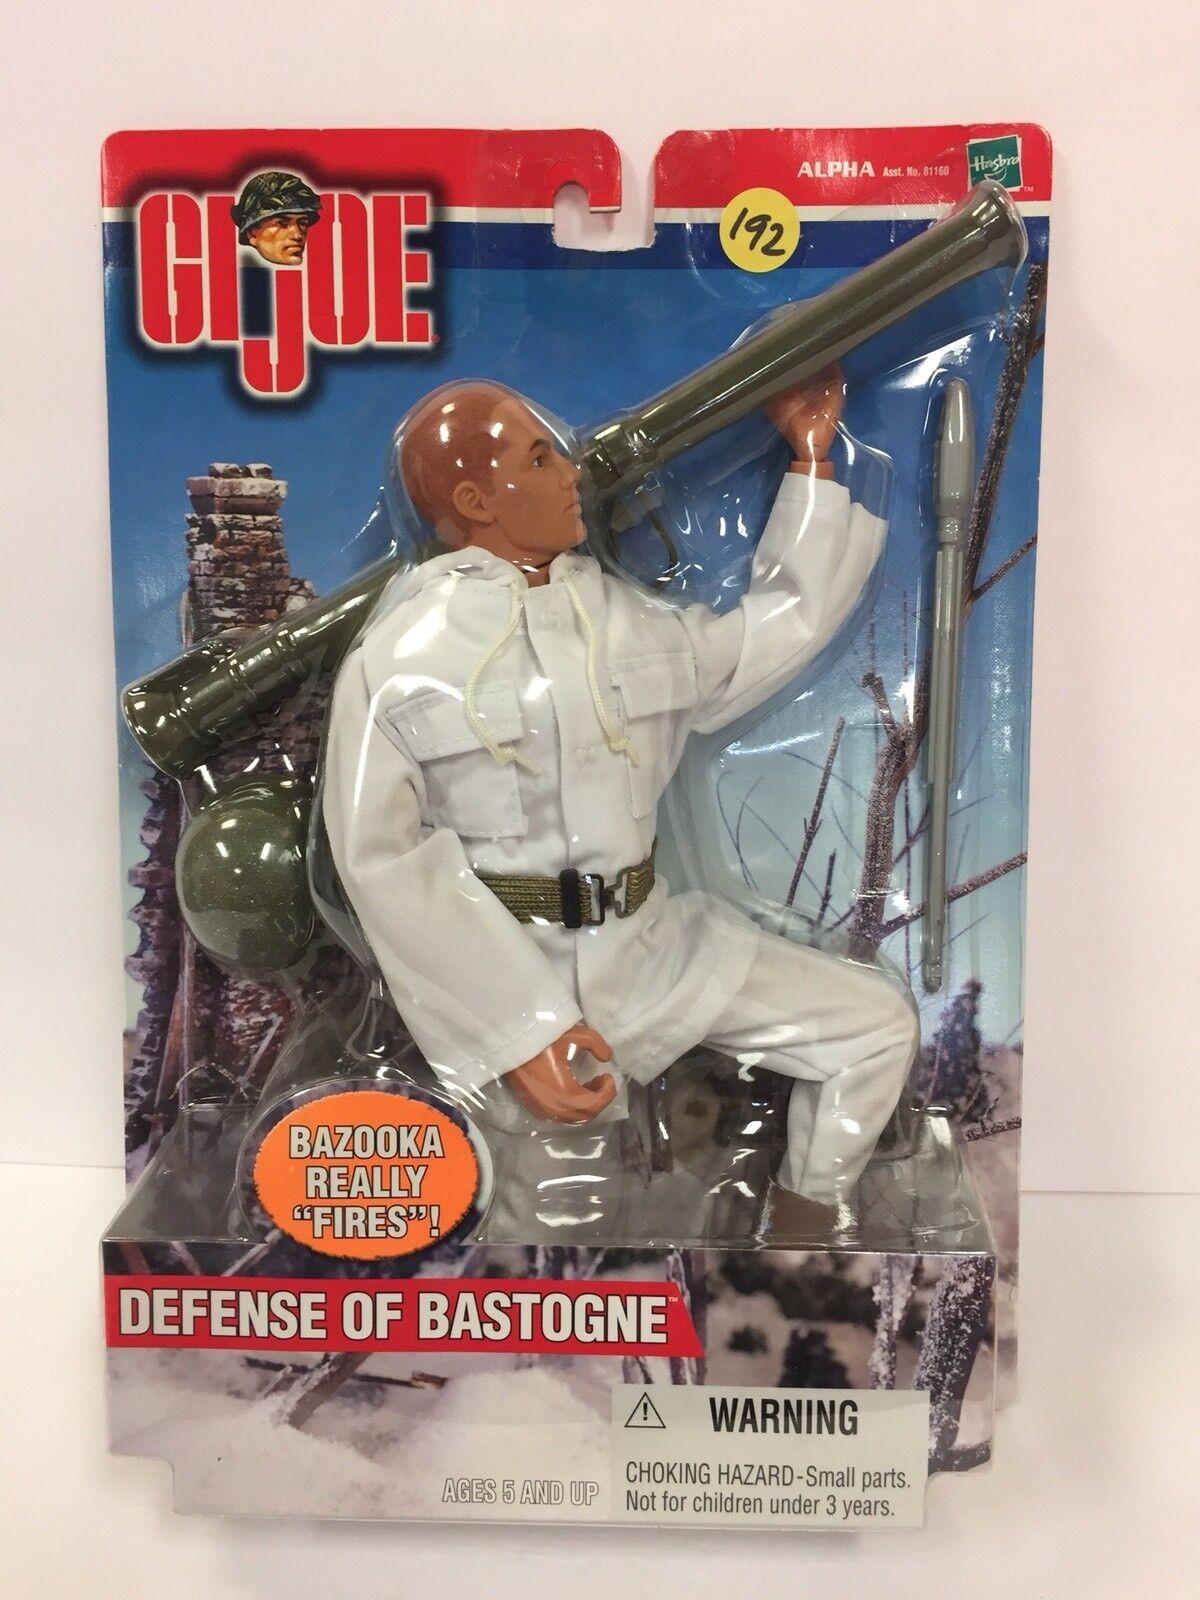 2000 Hasbro Hasbro Hasbro 12  GI JOE Defense of Bastogne Bazooka really  Fires  (7GI192) 620daf